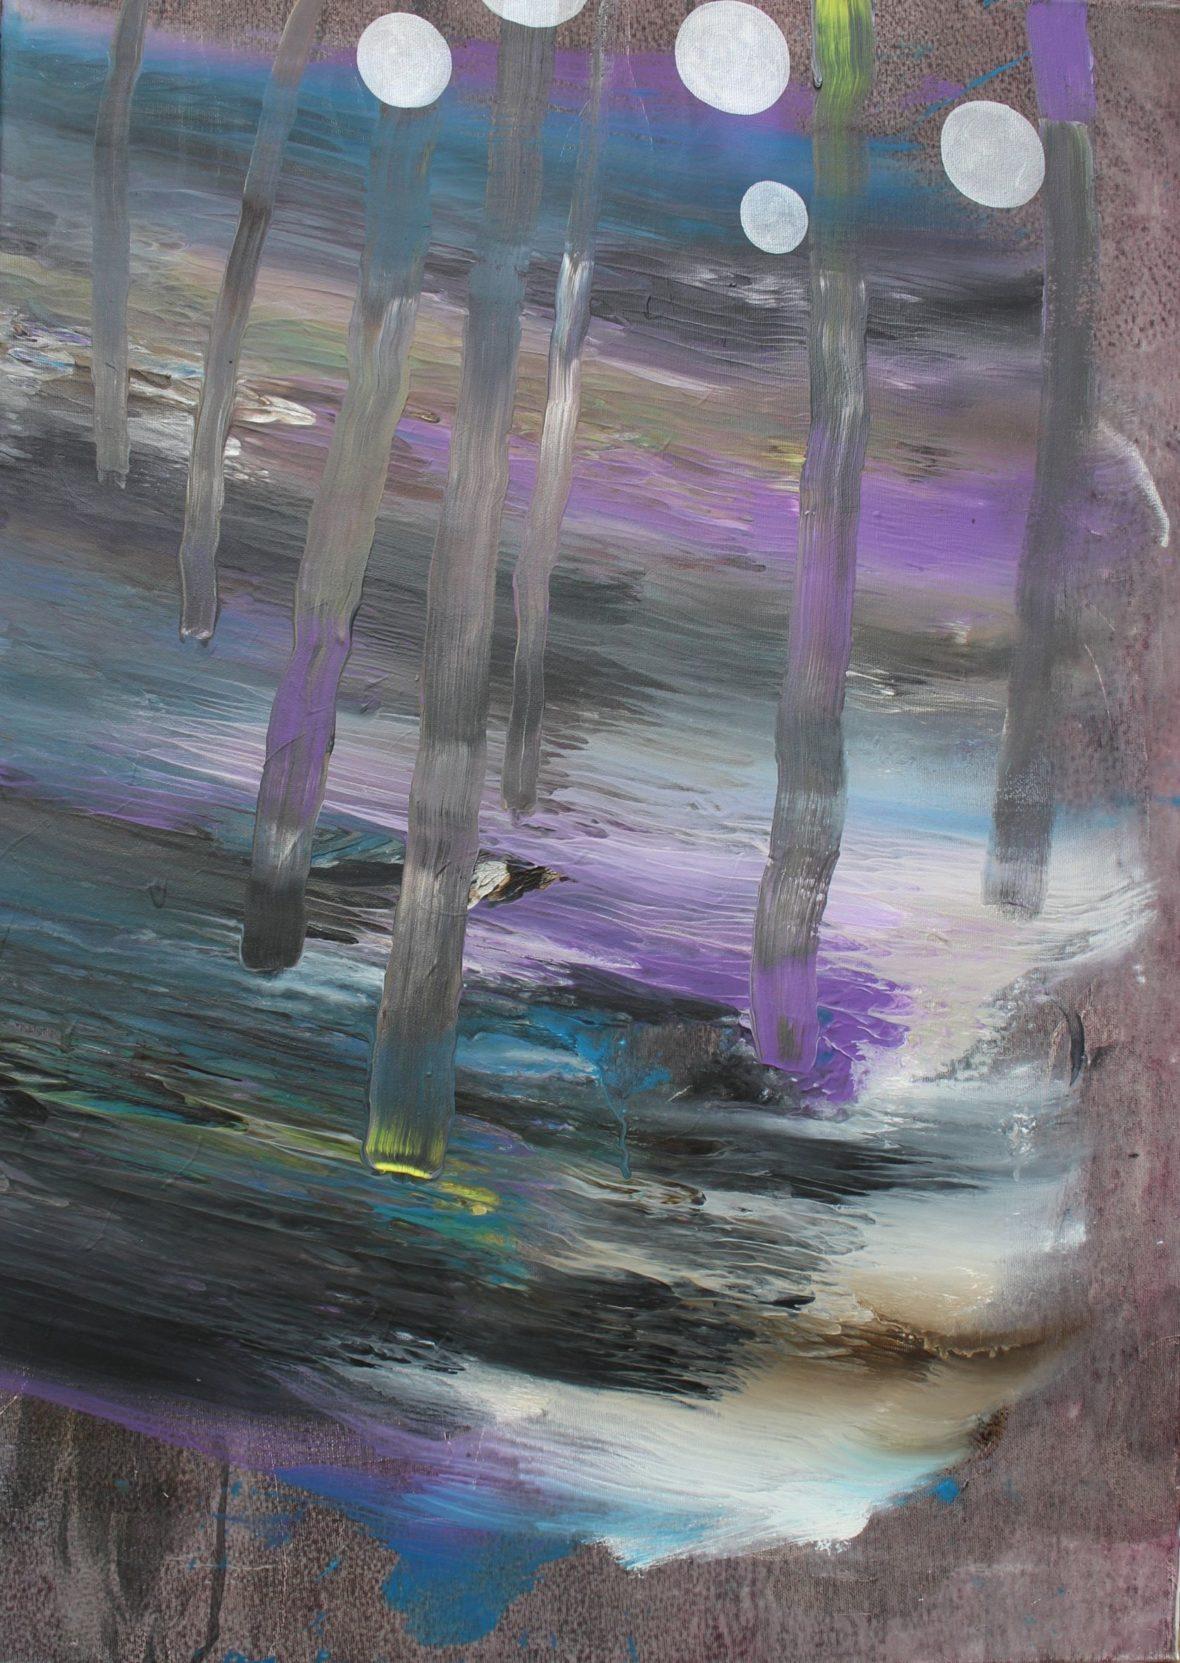 Sarjasta Kaunismaailma 53., 70x50cm, akryylimaalaus, 2016